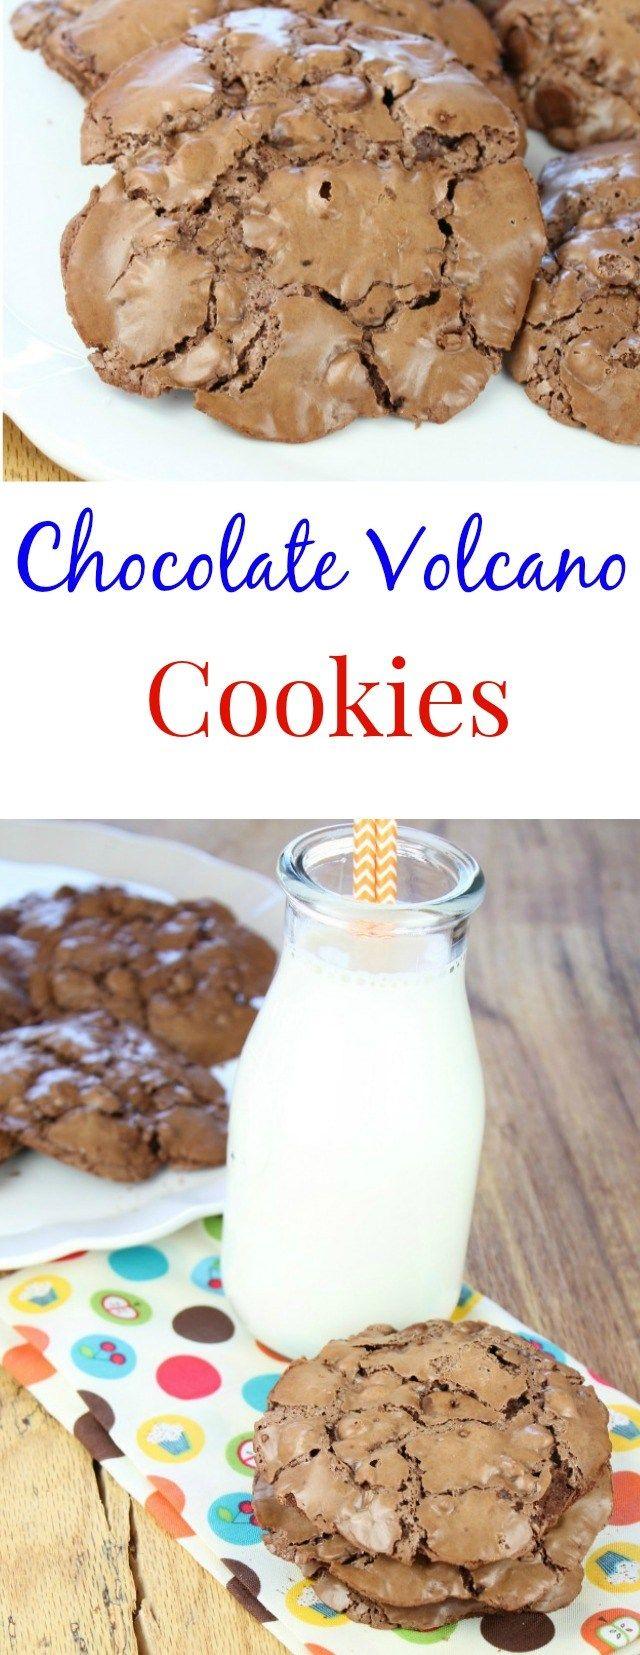 Chocolate Volcano Cookies ~ recipe found at missinthekitchen.com